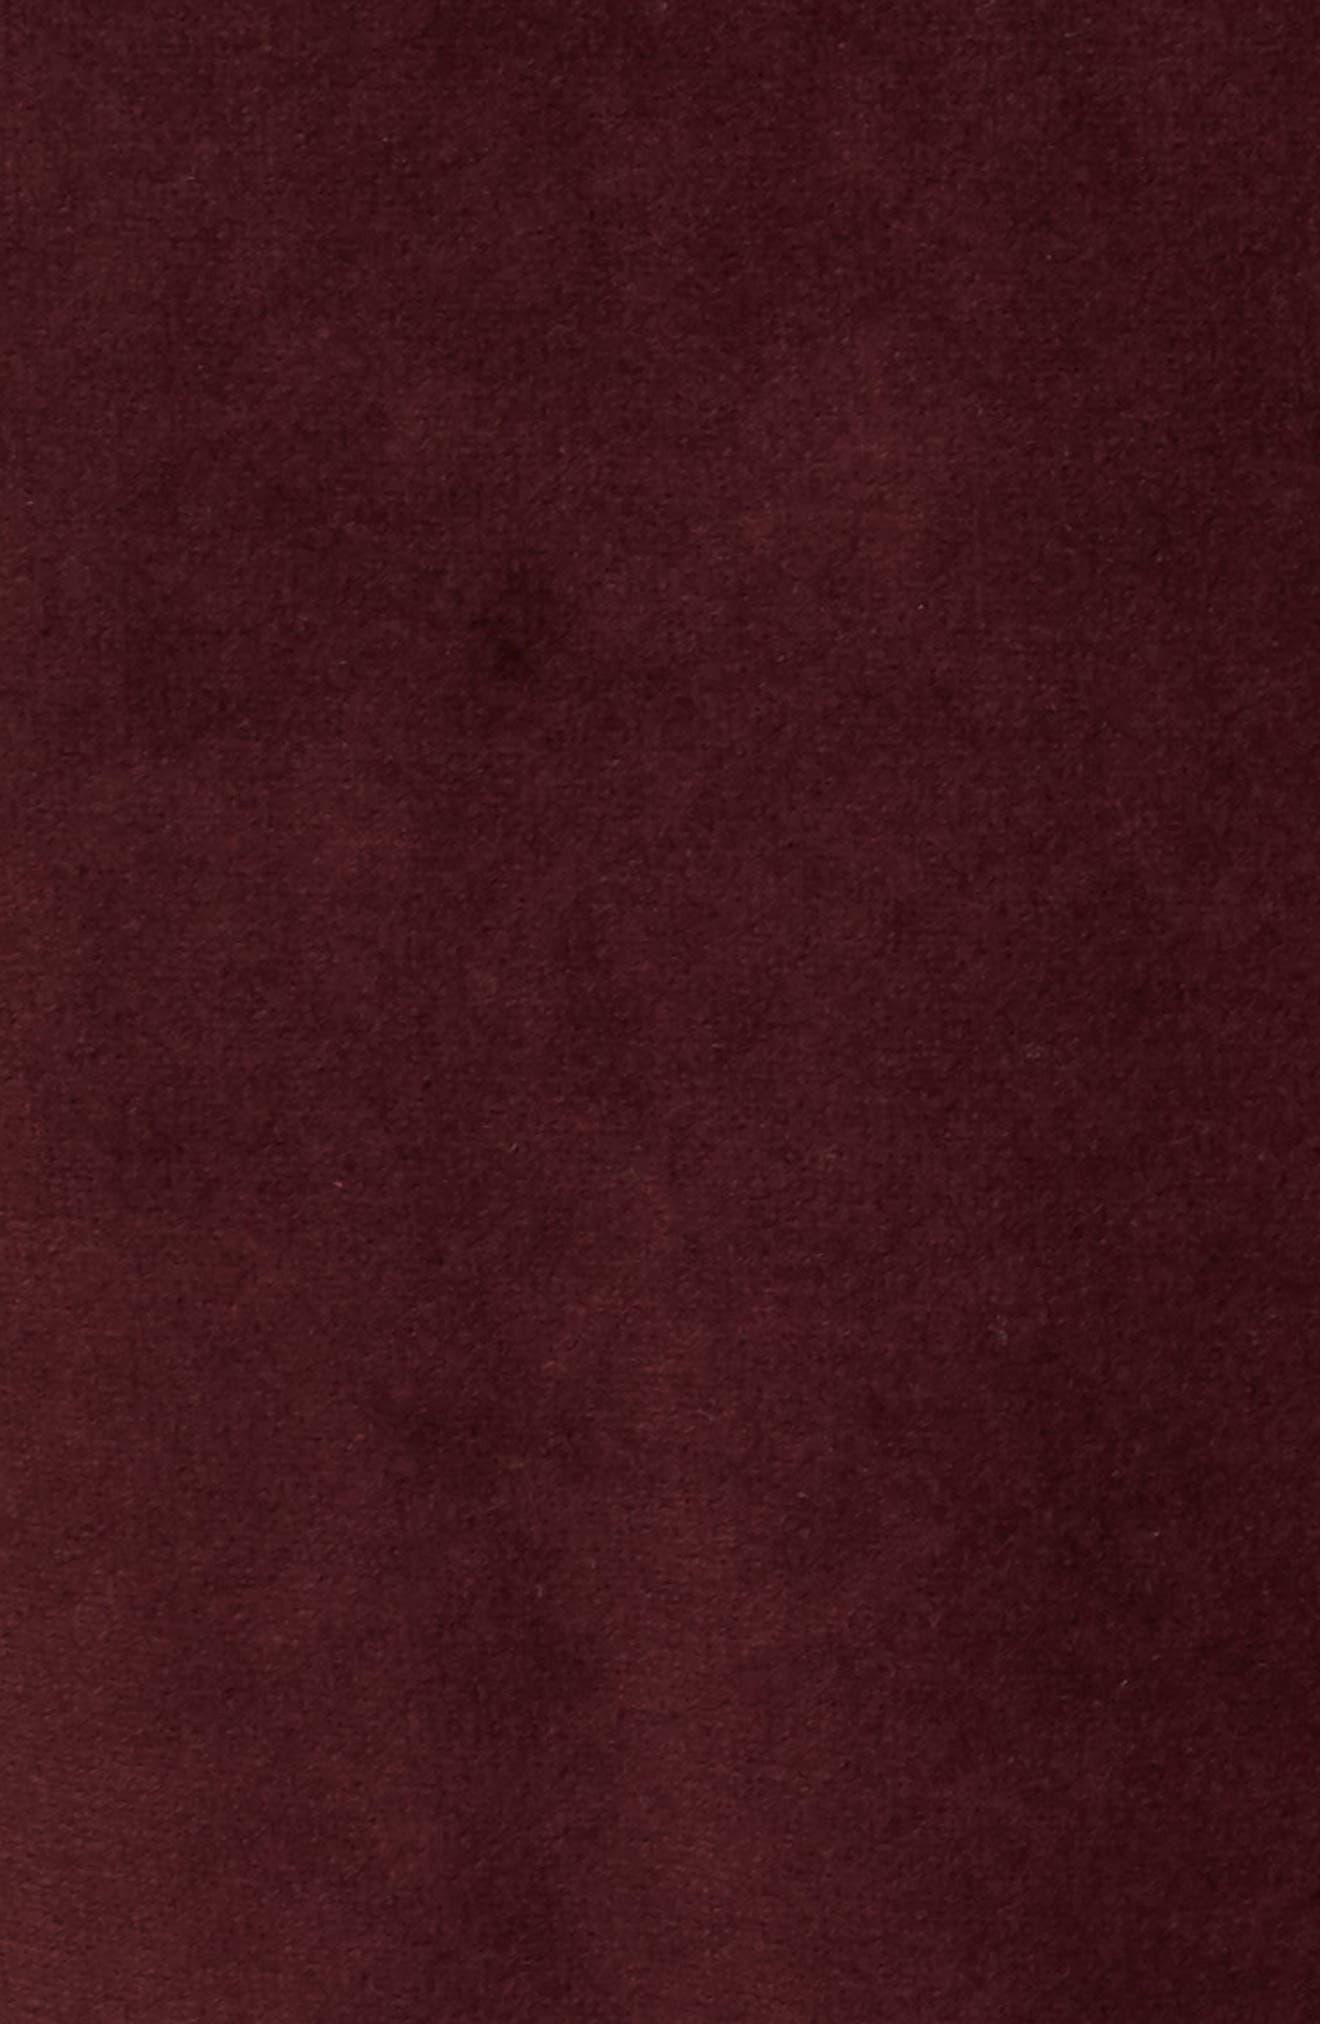 Velour Jogger Pants,                             Alternate thumbnail 5, color,                             Good Burgundy